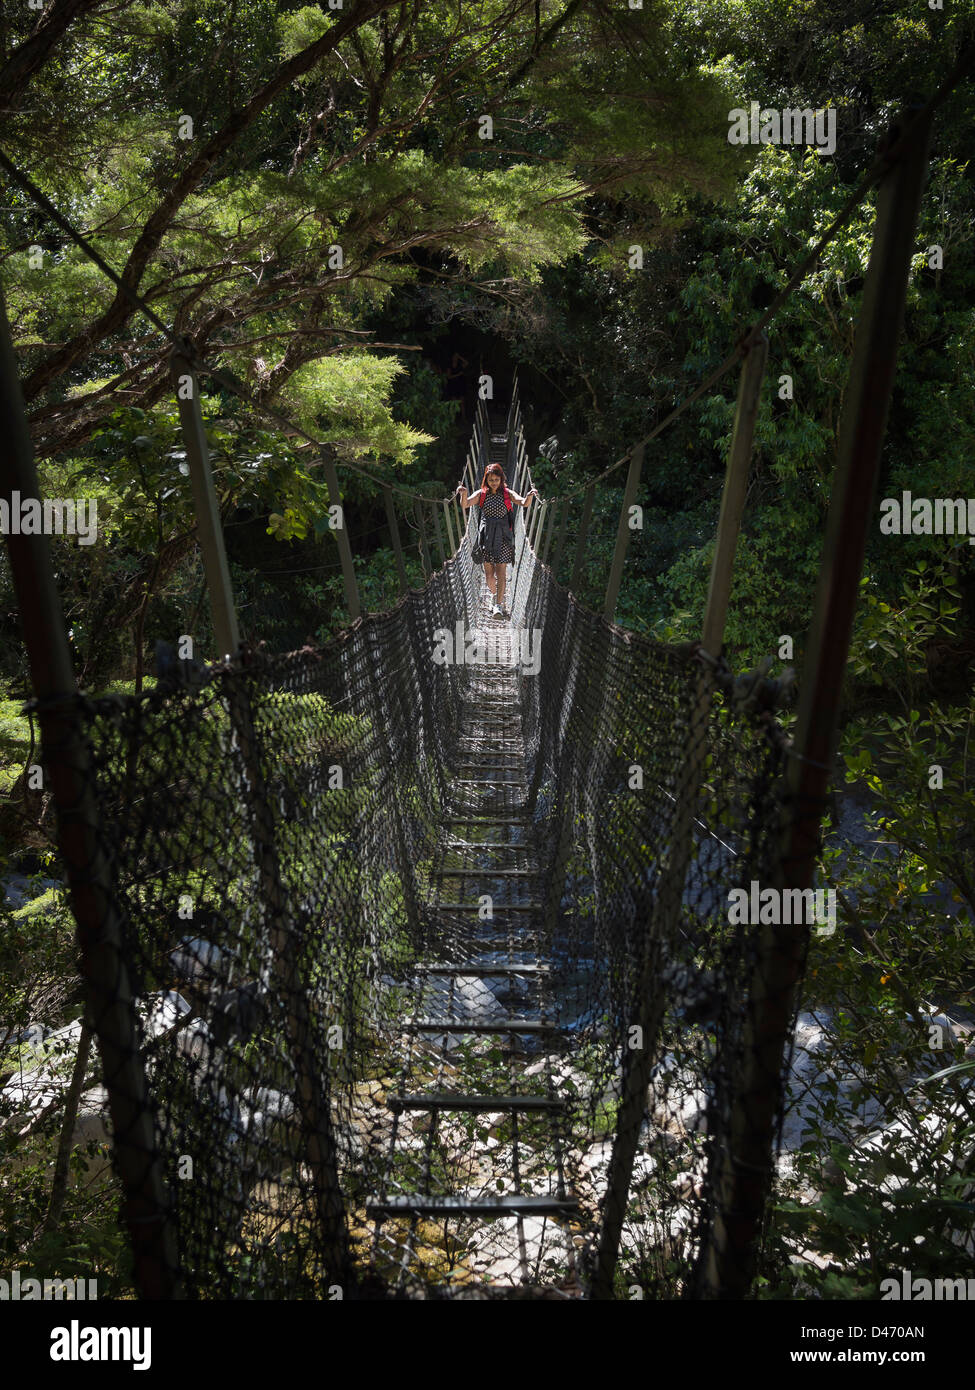 Suspension bridge over Wainui river, Abel Tasman National Park, South Island, New Zealand. - Stock Image